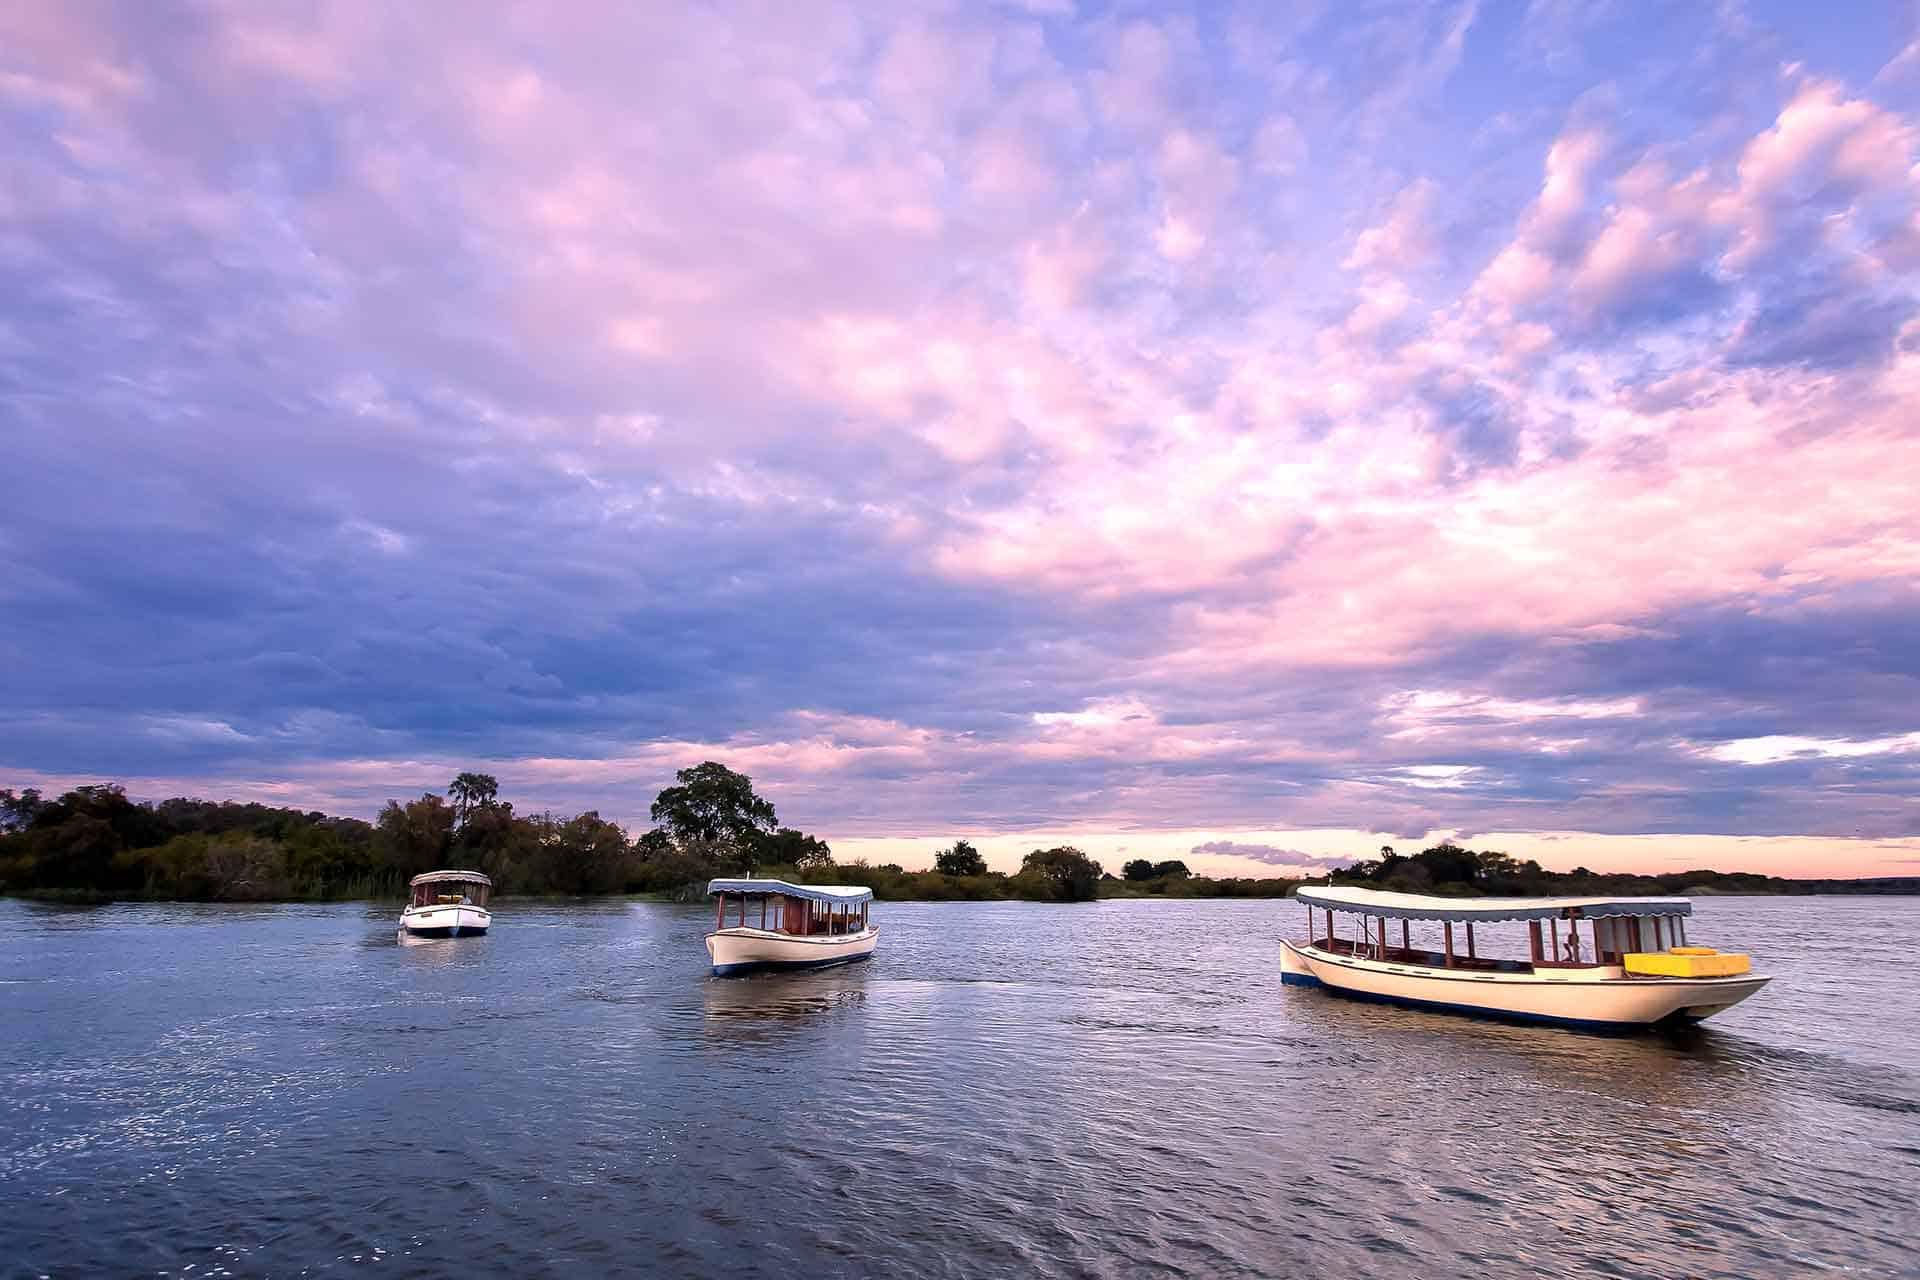 Raikane River Cruise Sunset 2